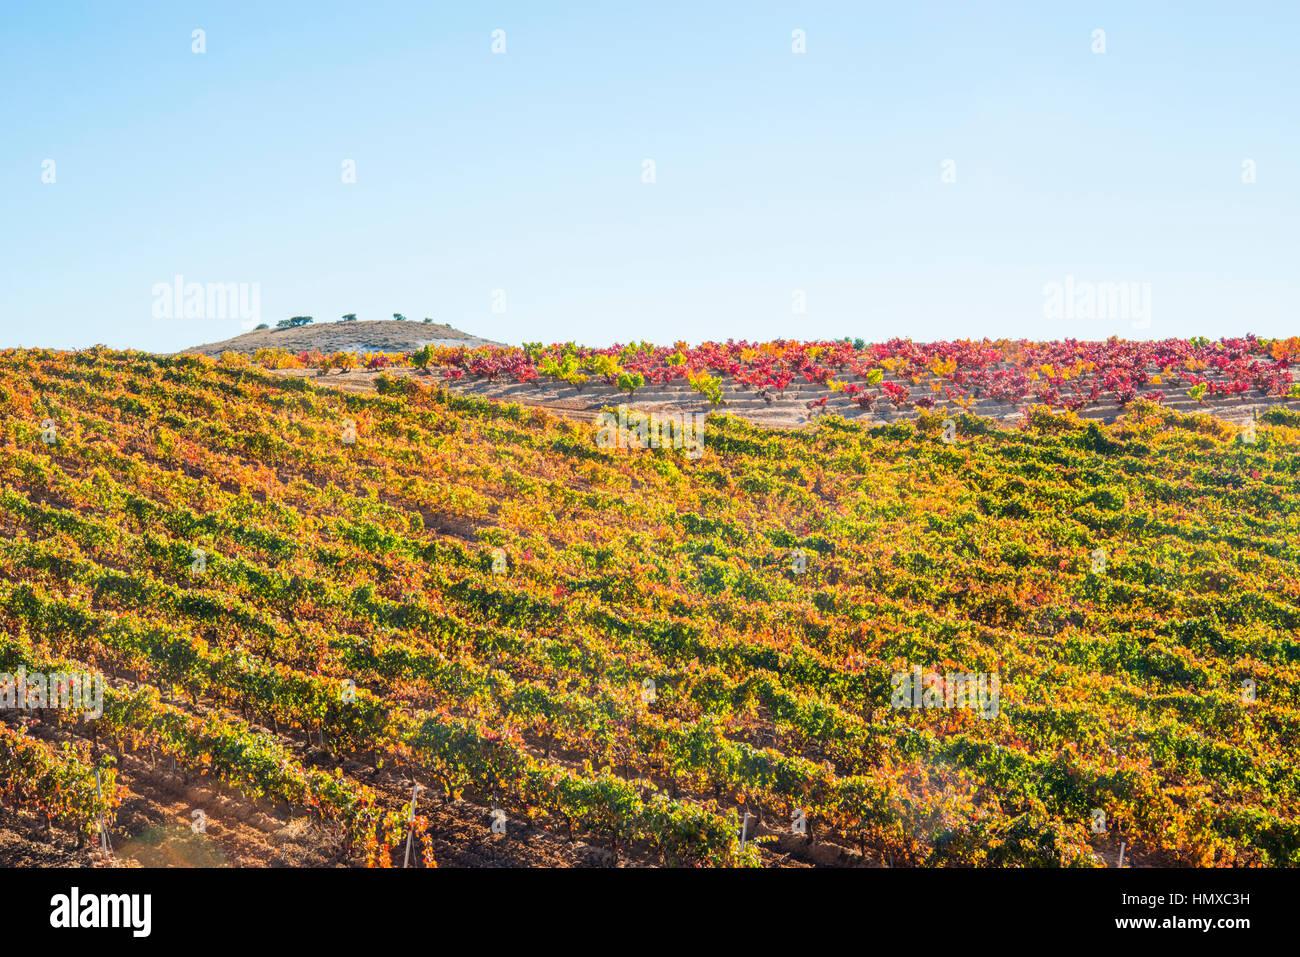 Vineyards in Autumn. Ribera del Duero, Burgos province, Castilla Leon, Spain. - Stock Image